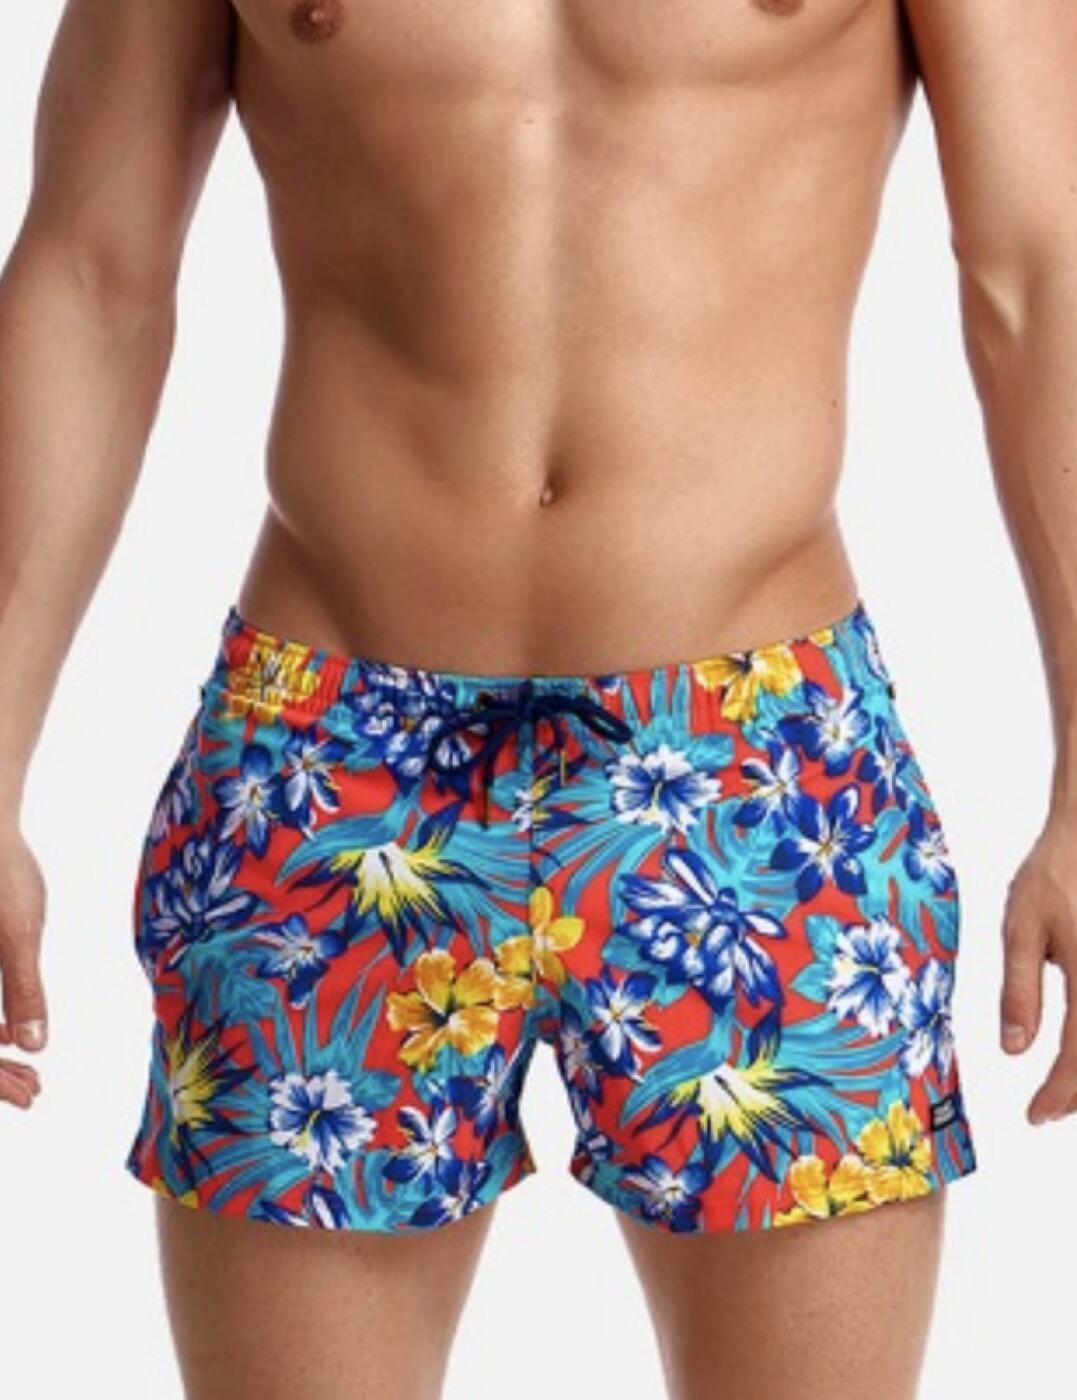 FT40M Funky Trunks Mens 'Shorty Shorts' Swim Short - FT40M02303 Aloha From Hawaii